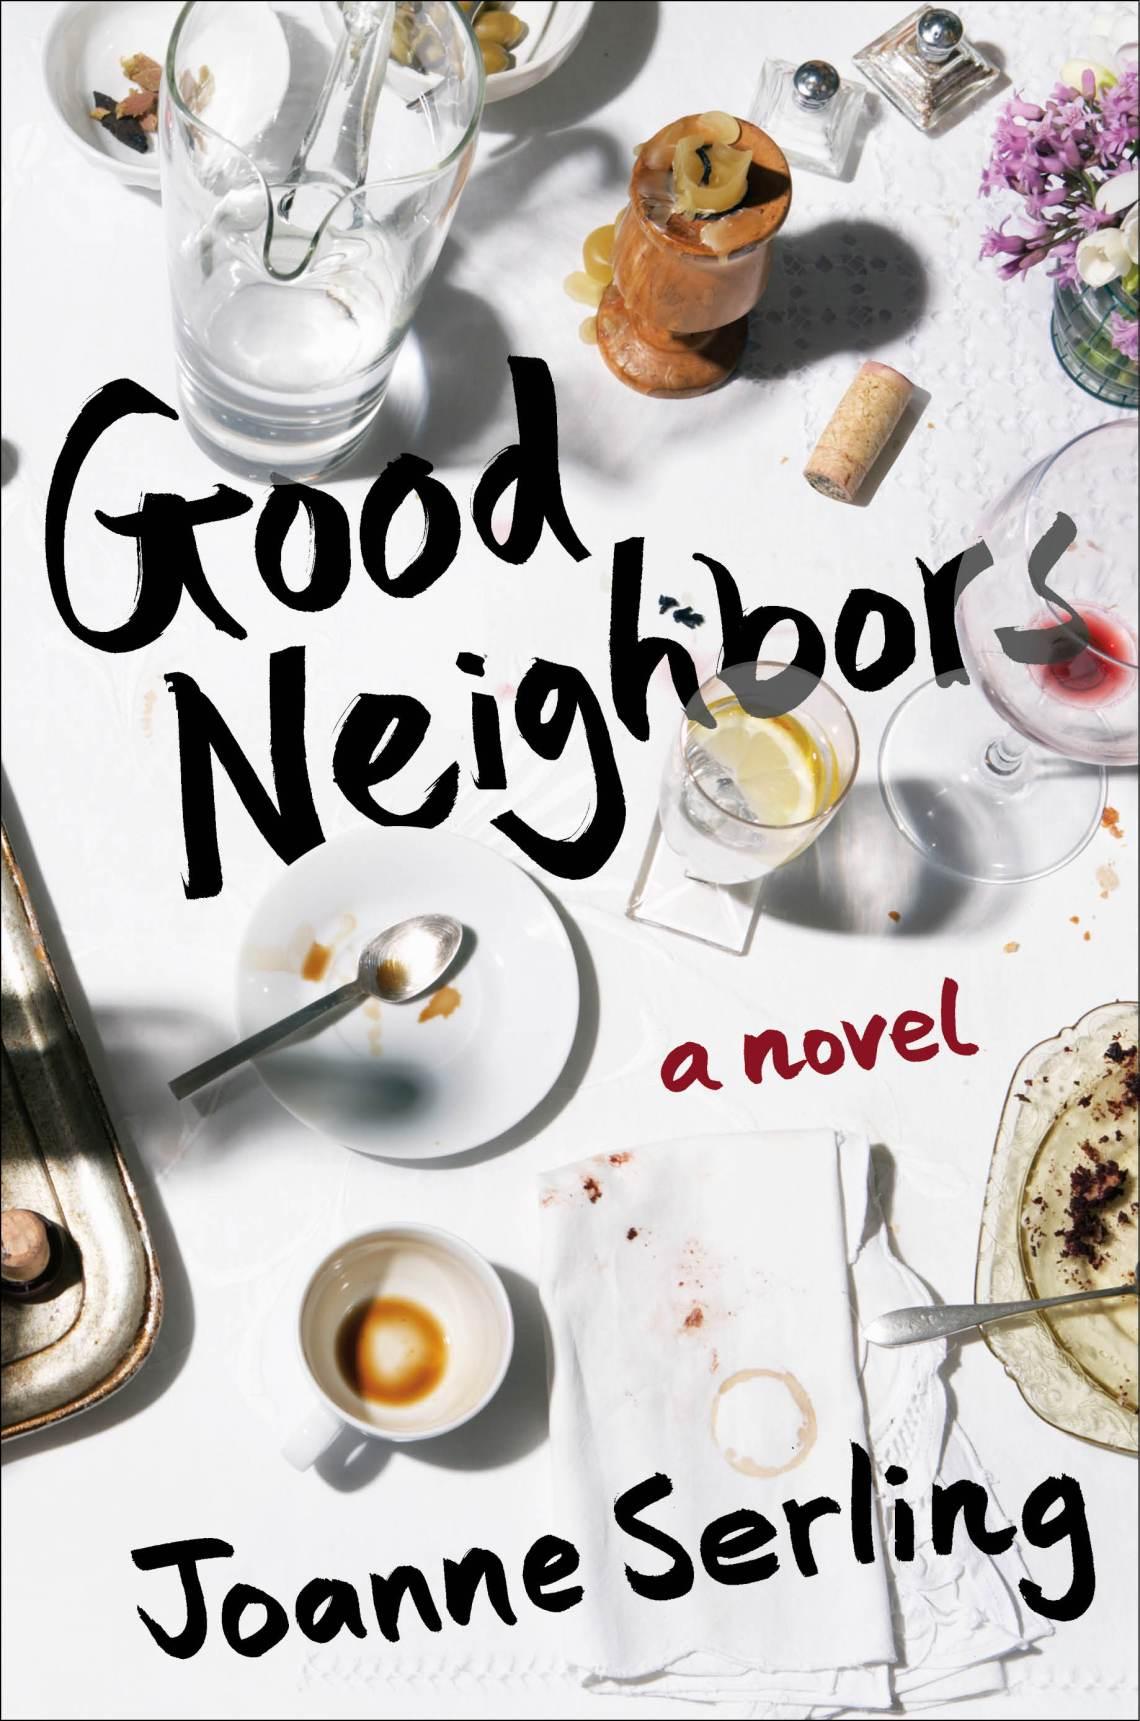 Good Neighbors final cover art 8.15